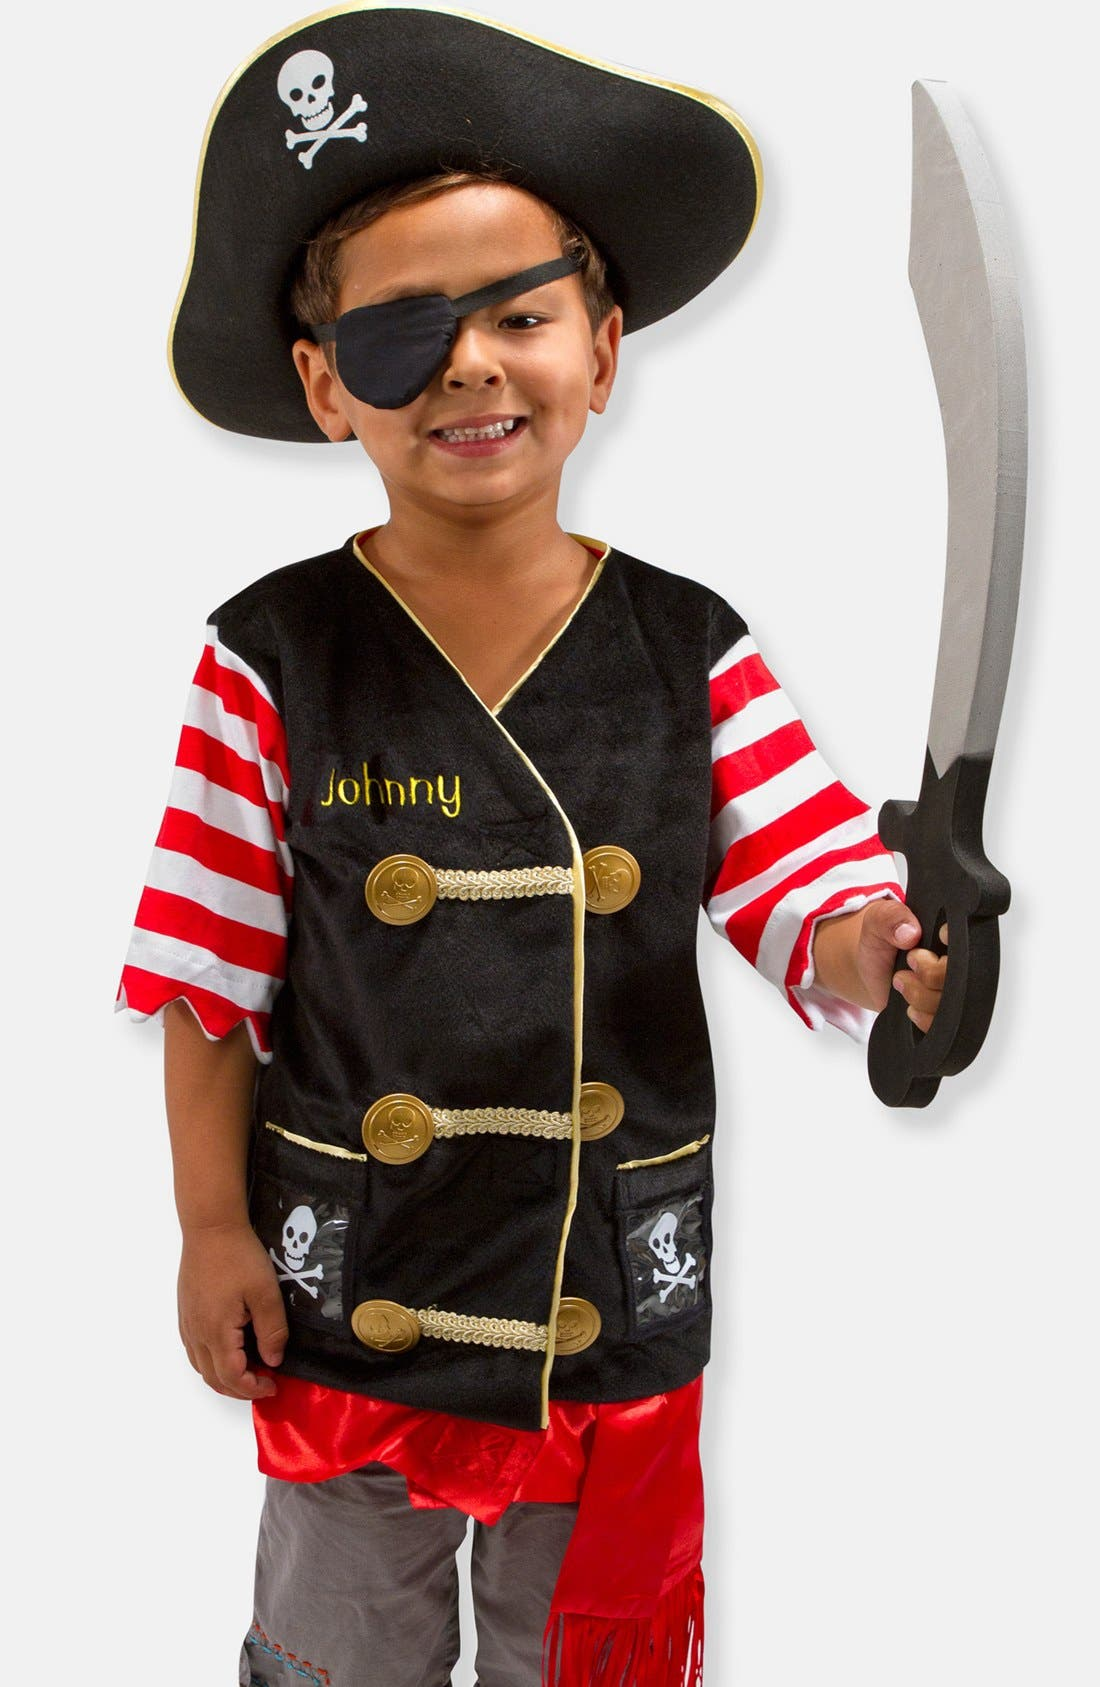 Main Image - Melissa & Doug Personalized Pirate Costume (Little Kid)